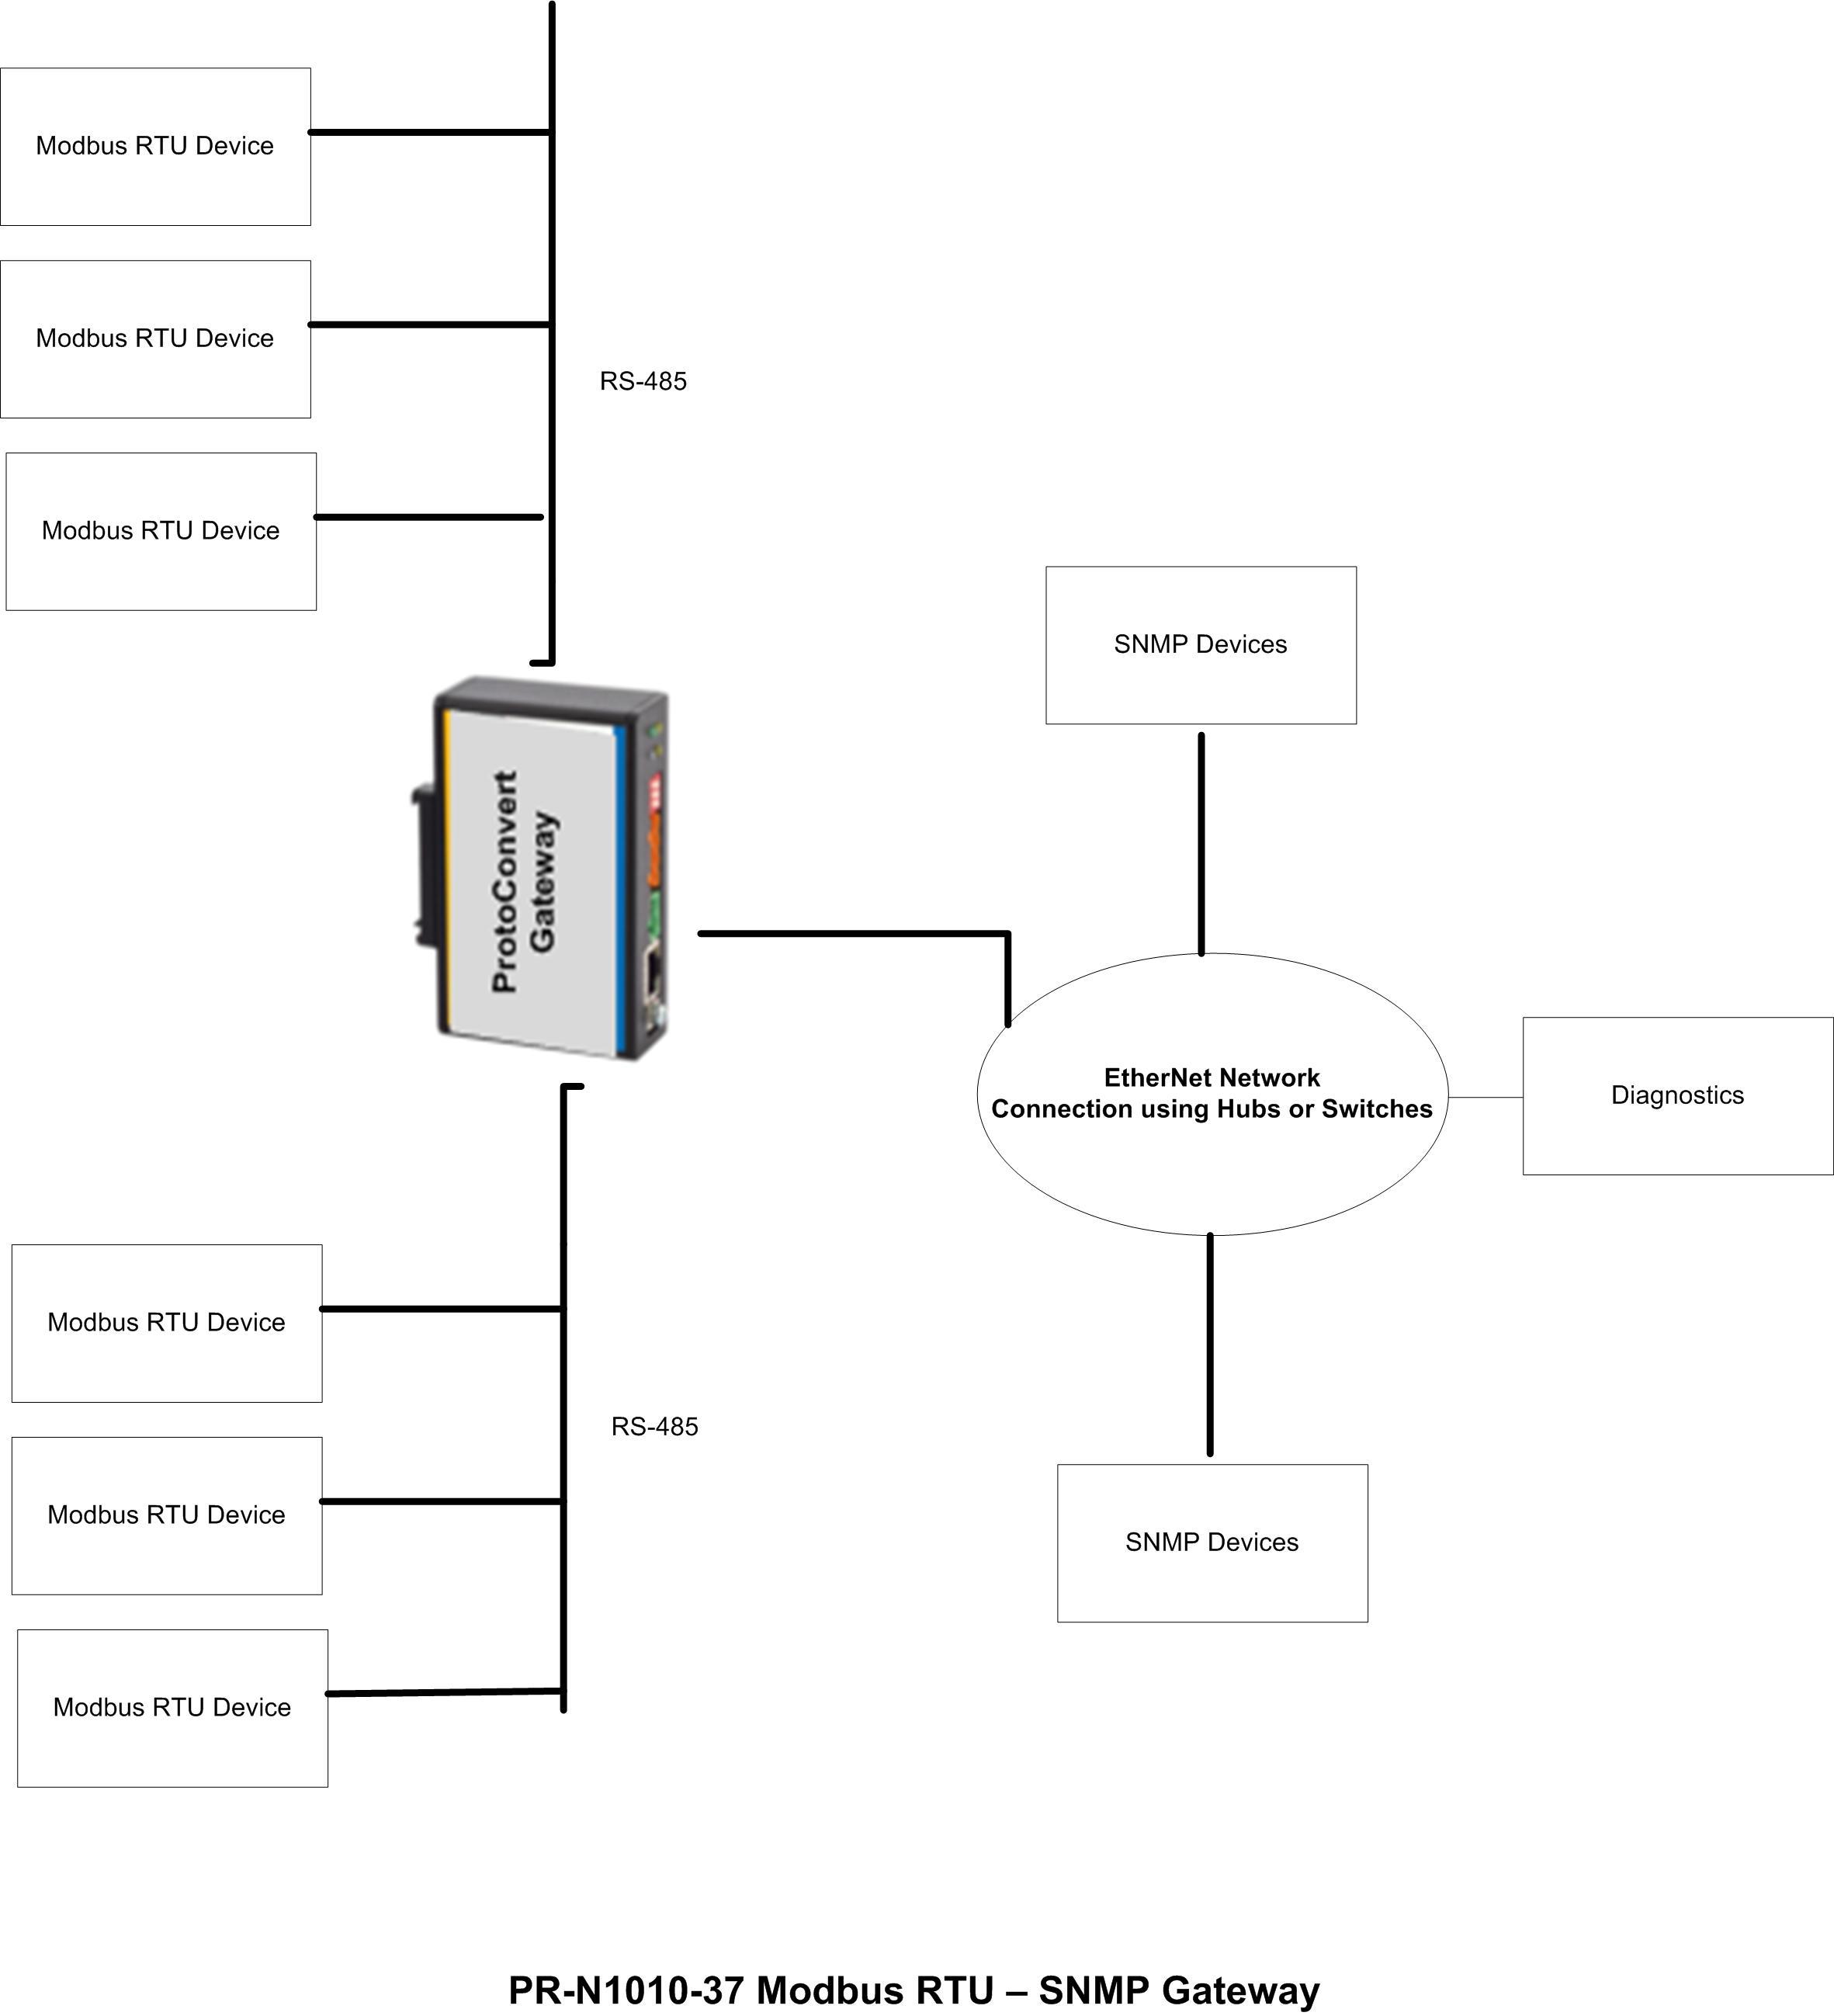 Basic Gas Furnace Wiring Diagram besides Goodman Air Handler Wiring Schematic Diagram further Basic Car Ac Electrical Diagram also Eb20b Wiring Diagram additionally Car Aircon Thermostat Wiring Diagram. on heil air handler wiring diagram